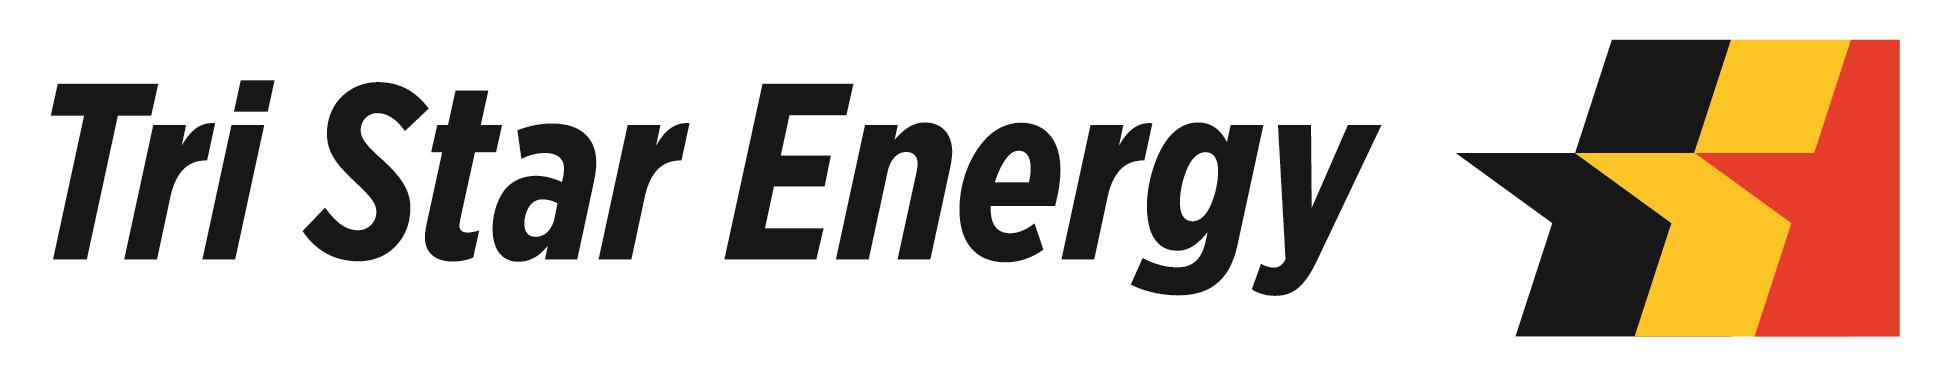 Tri Star Energy Company Logo